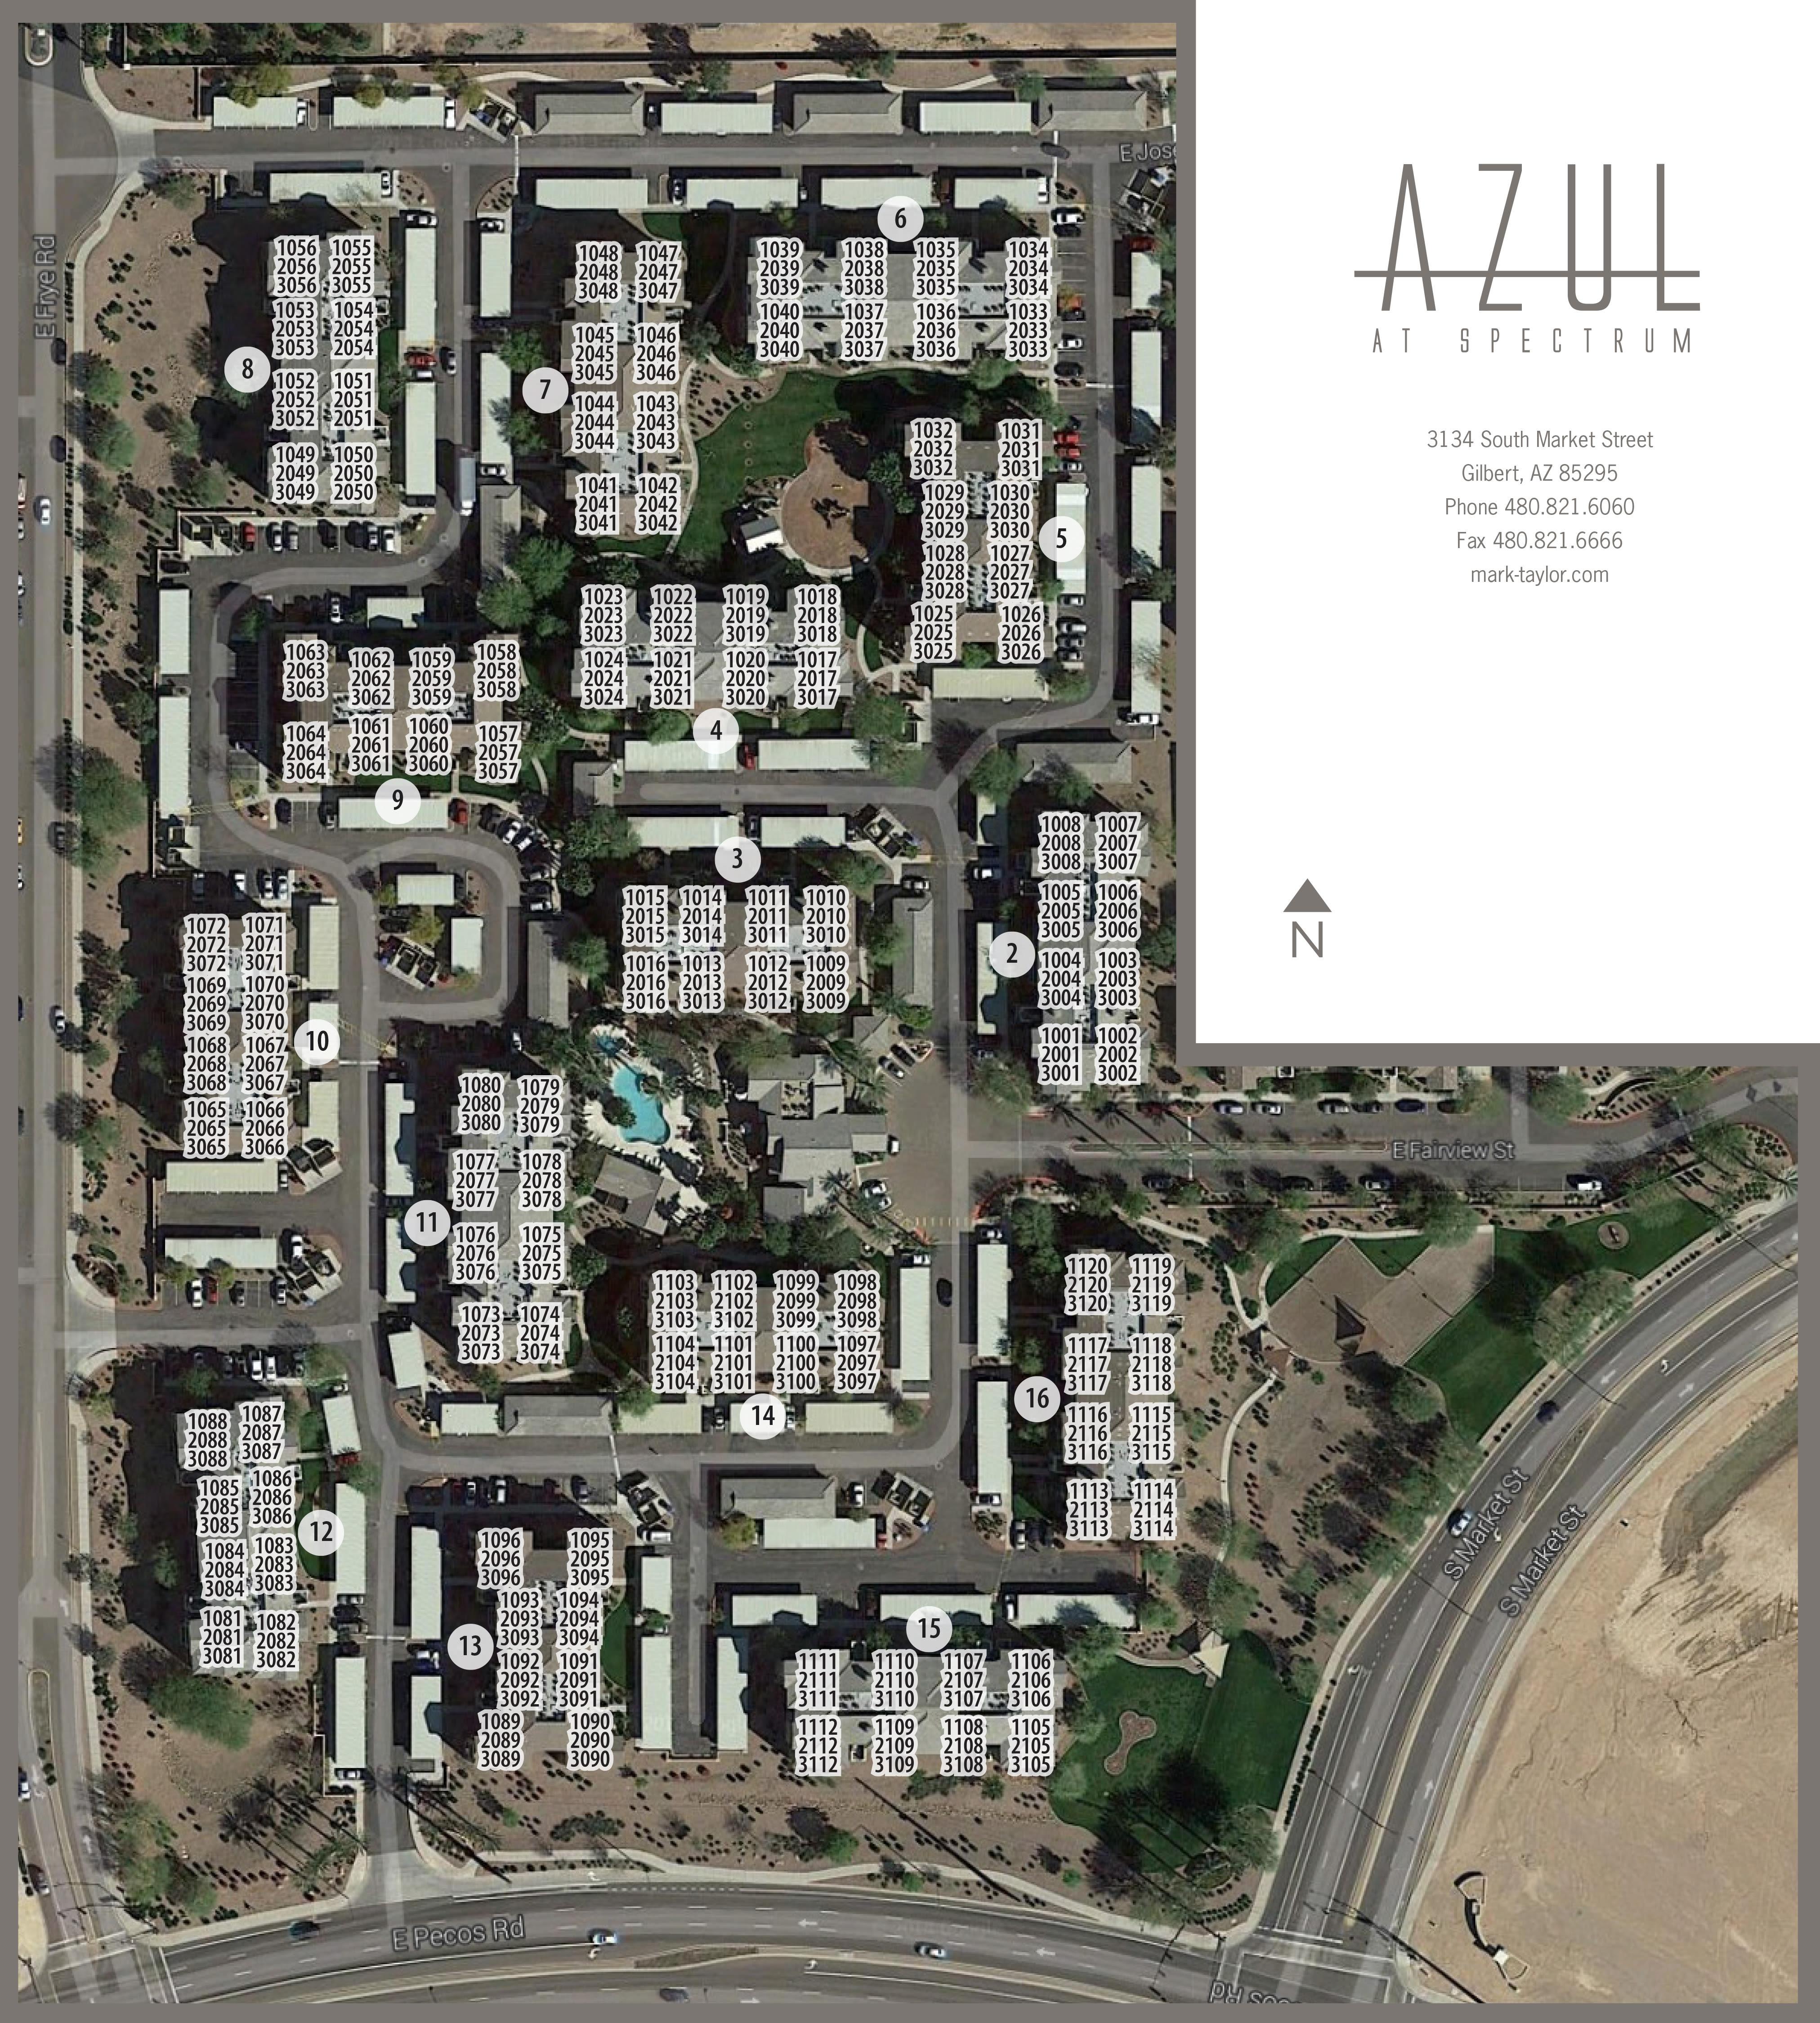 Luxury 1, 2 & 3 Bedroom Apartments In Gilbert, AZ